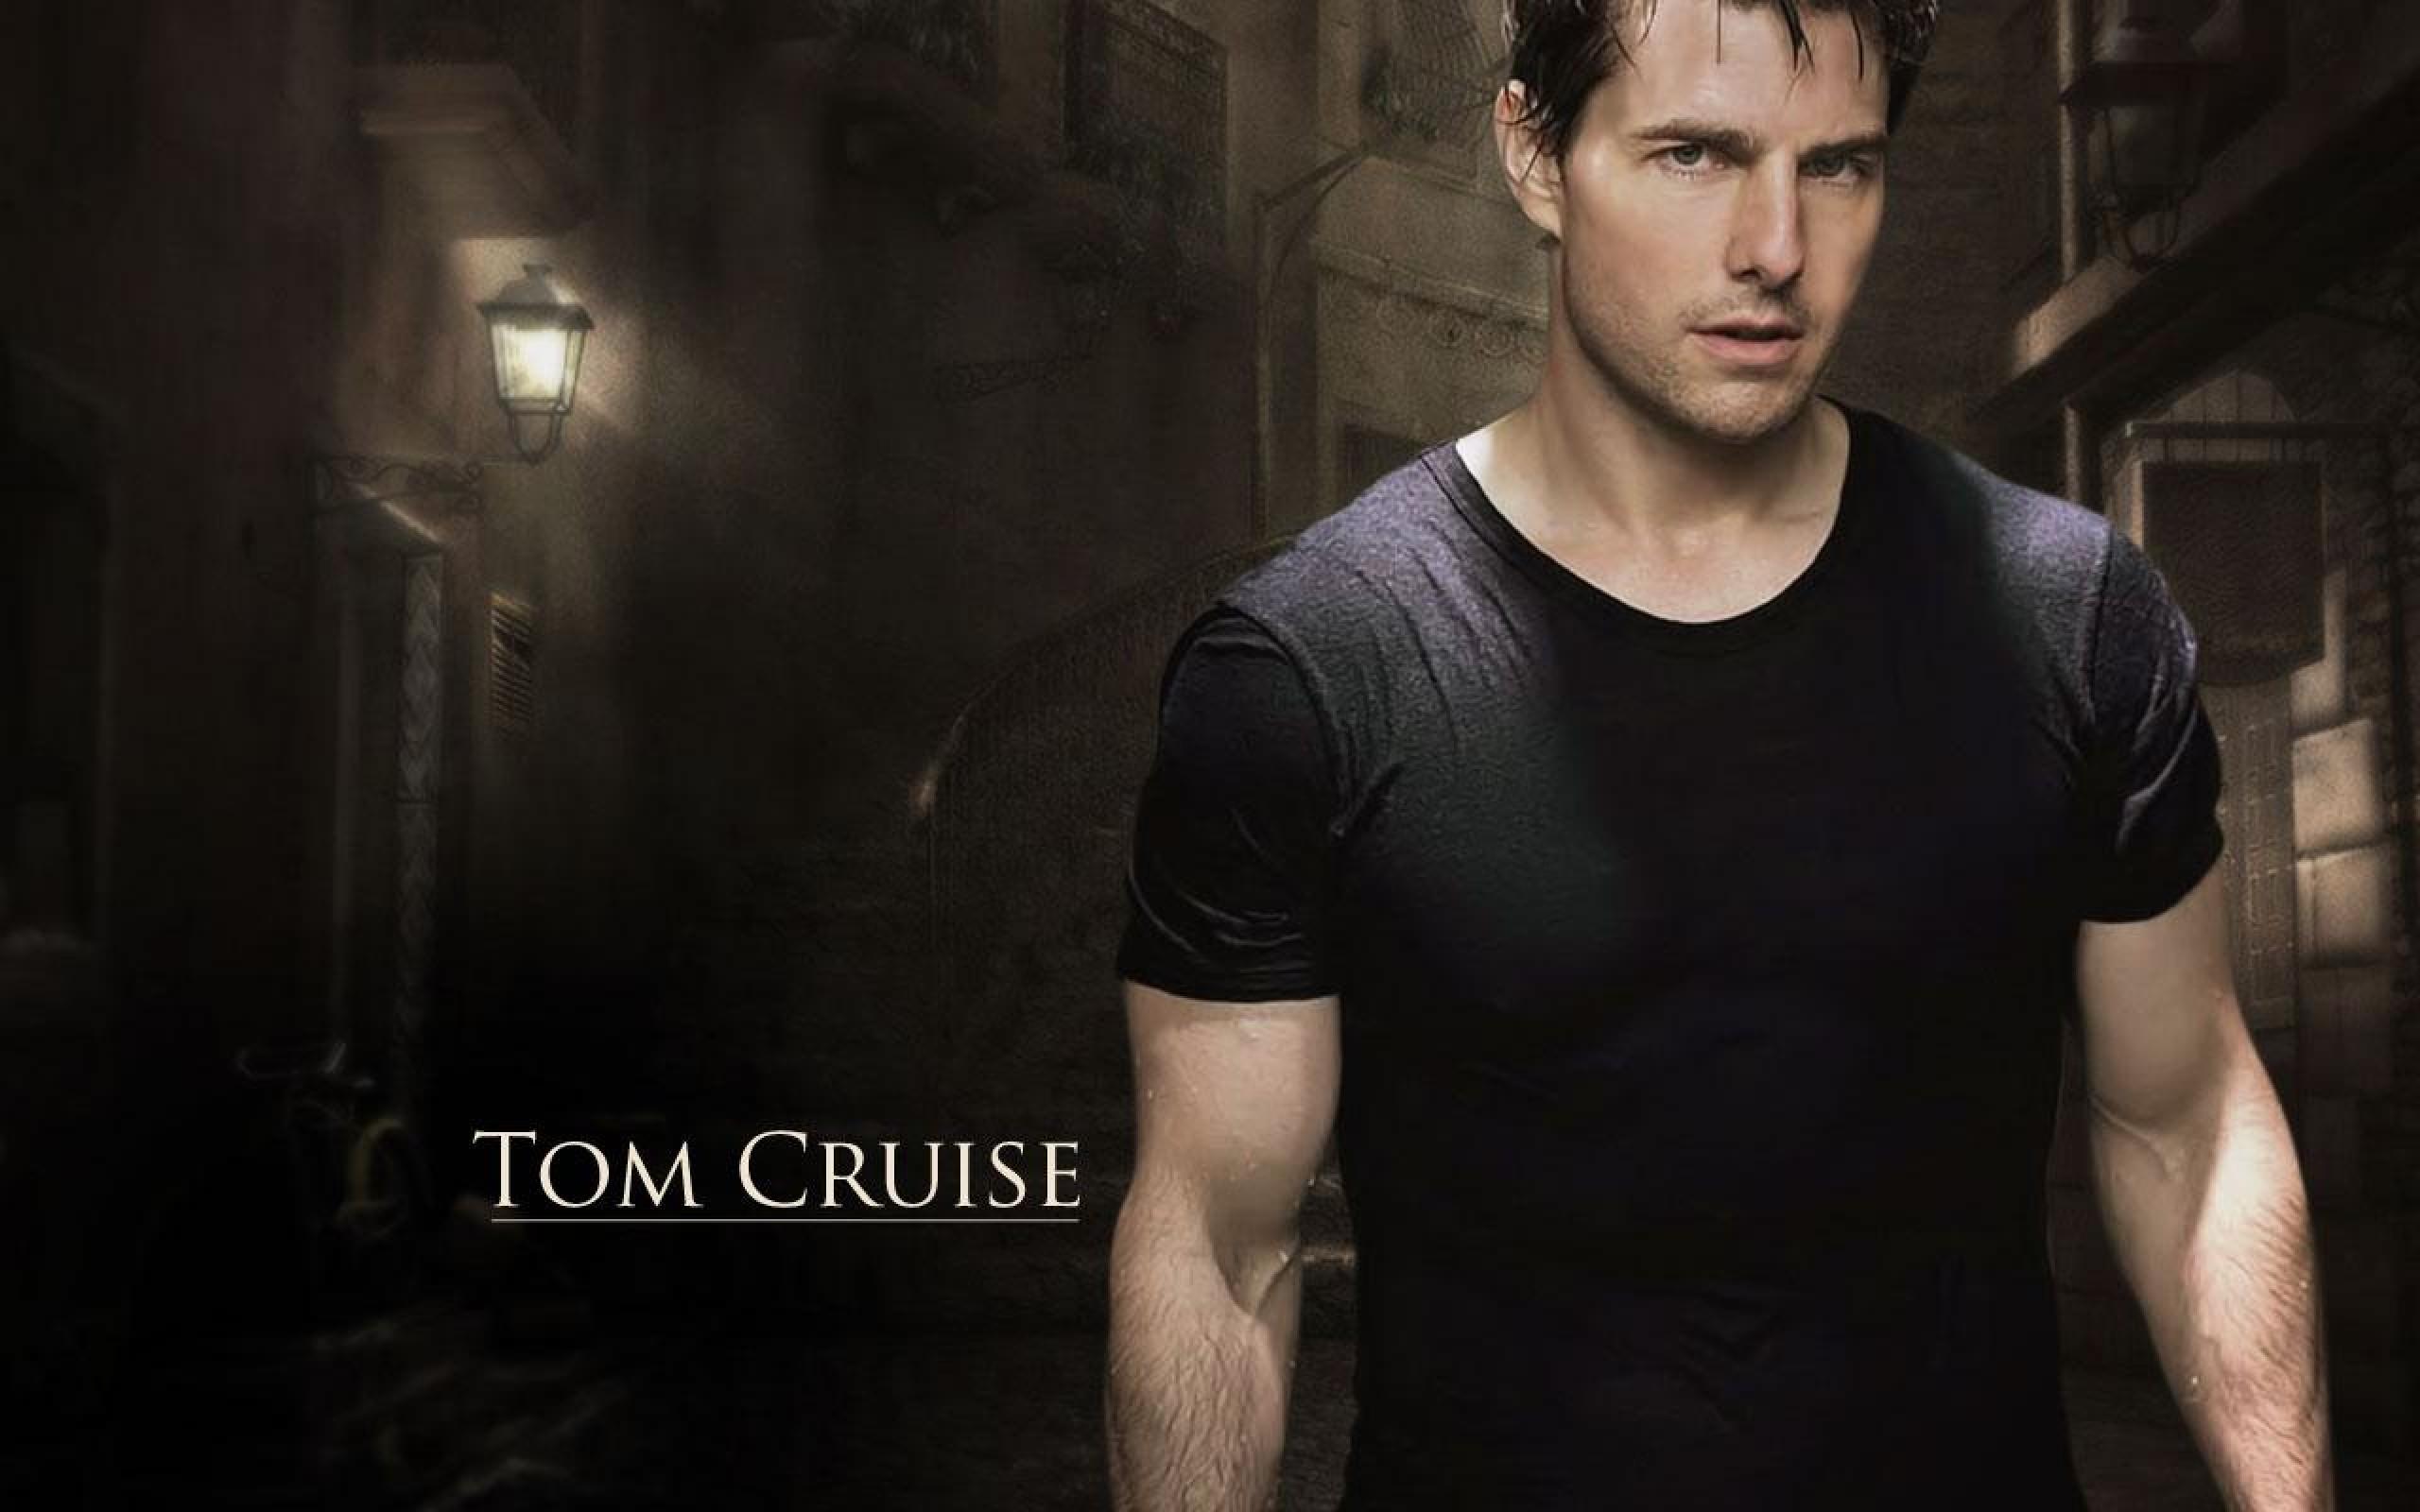 Tom Cruise HD Wallpapers • PoPoPics.com